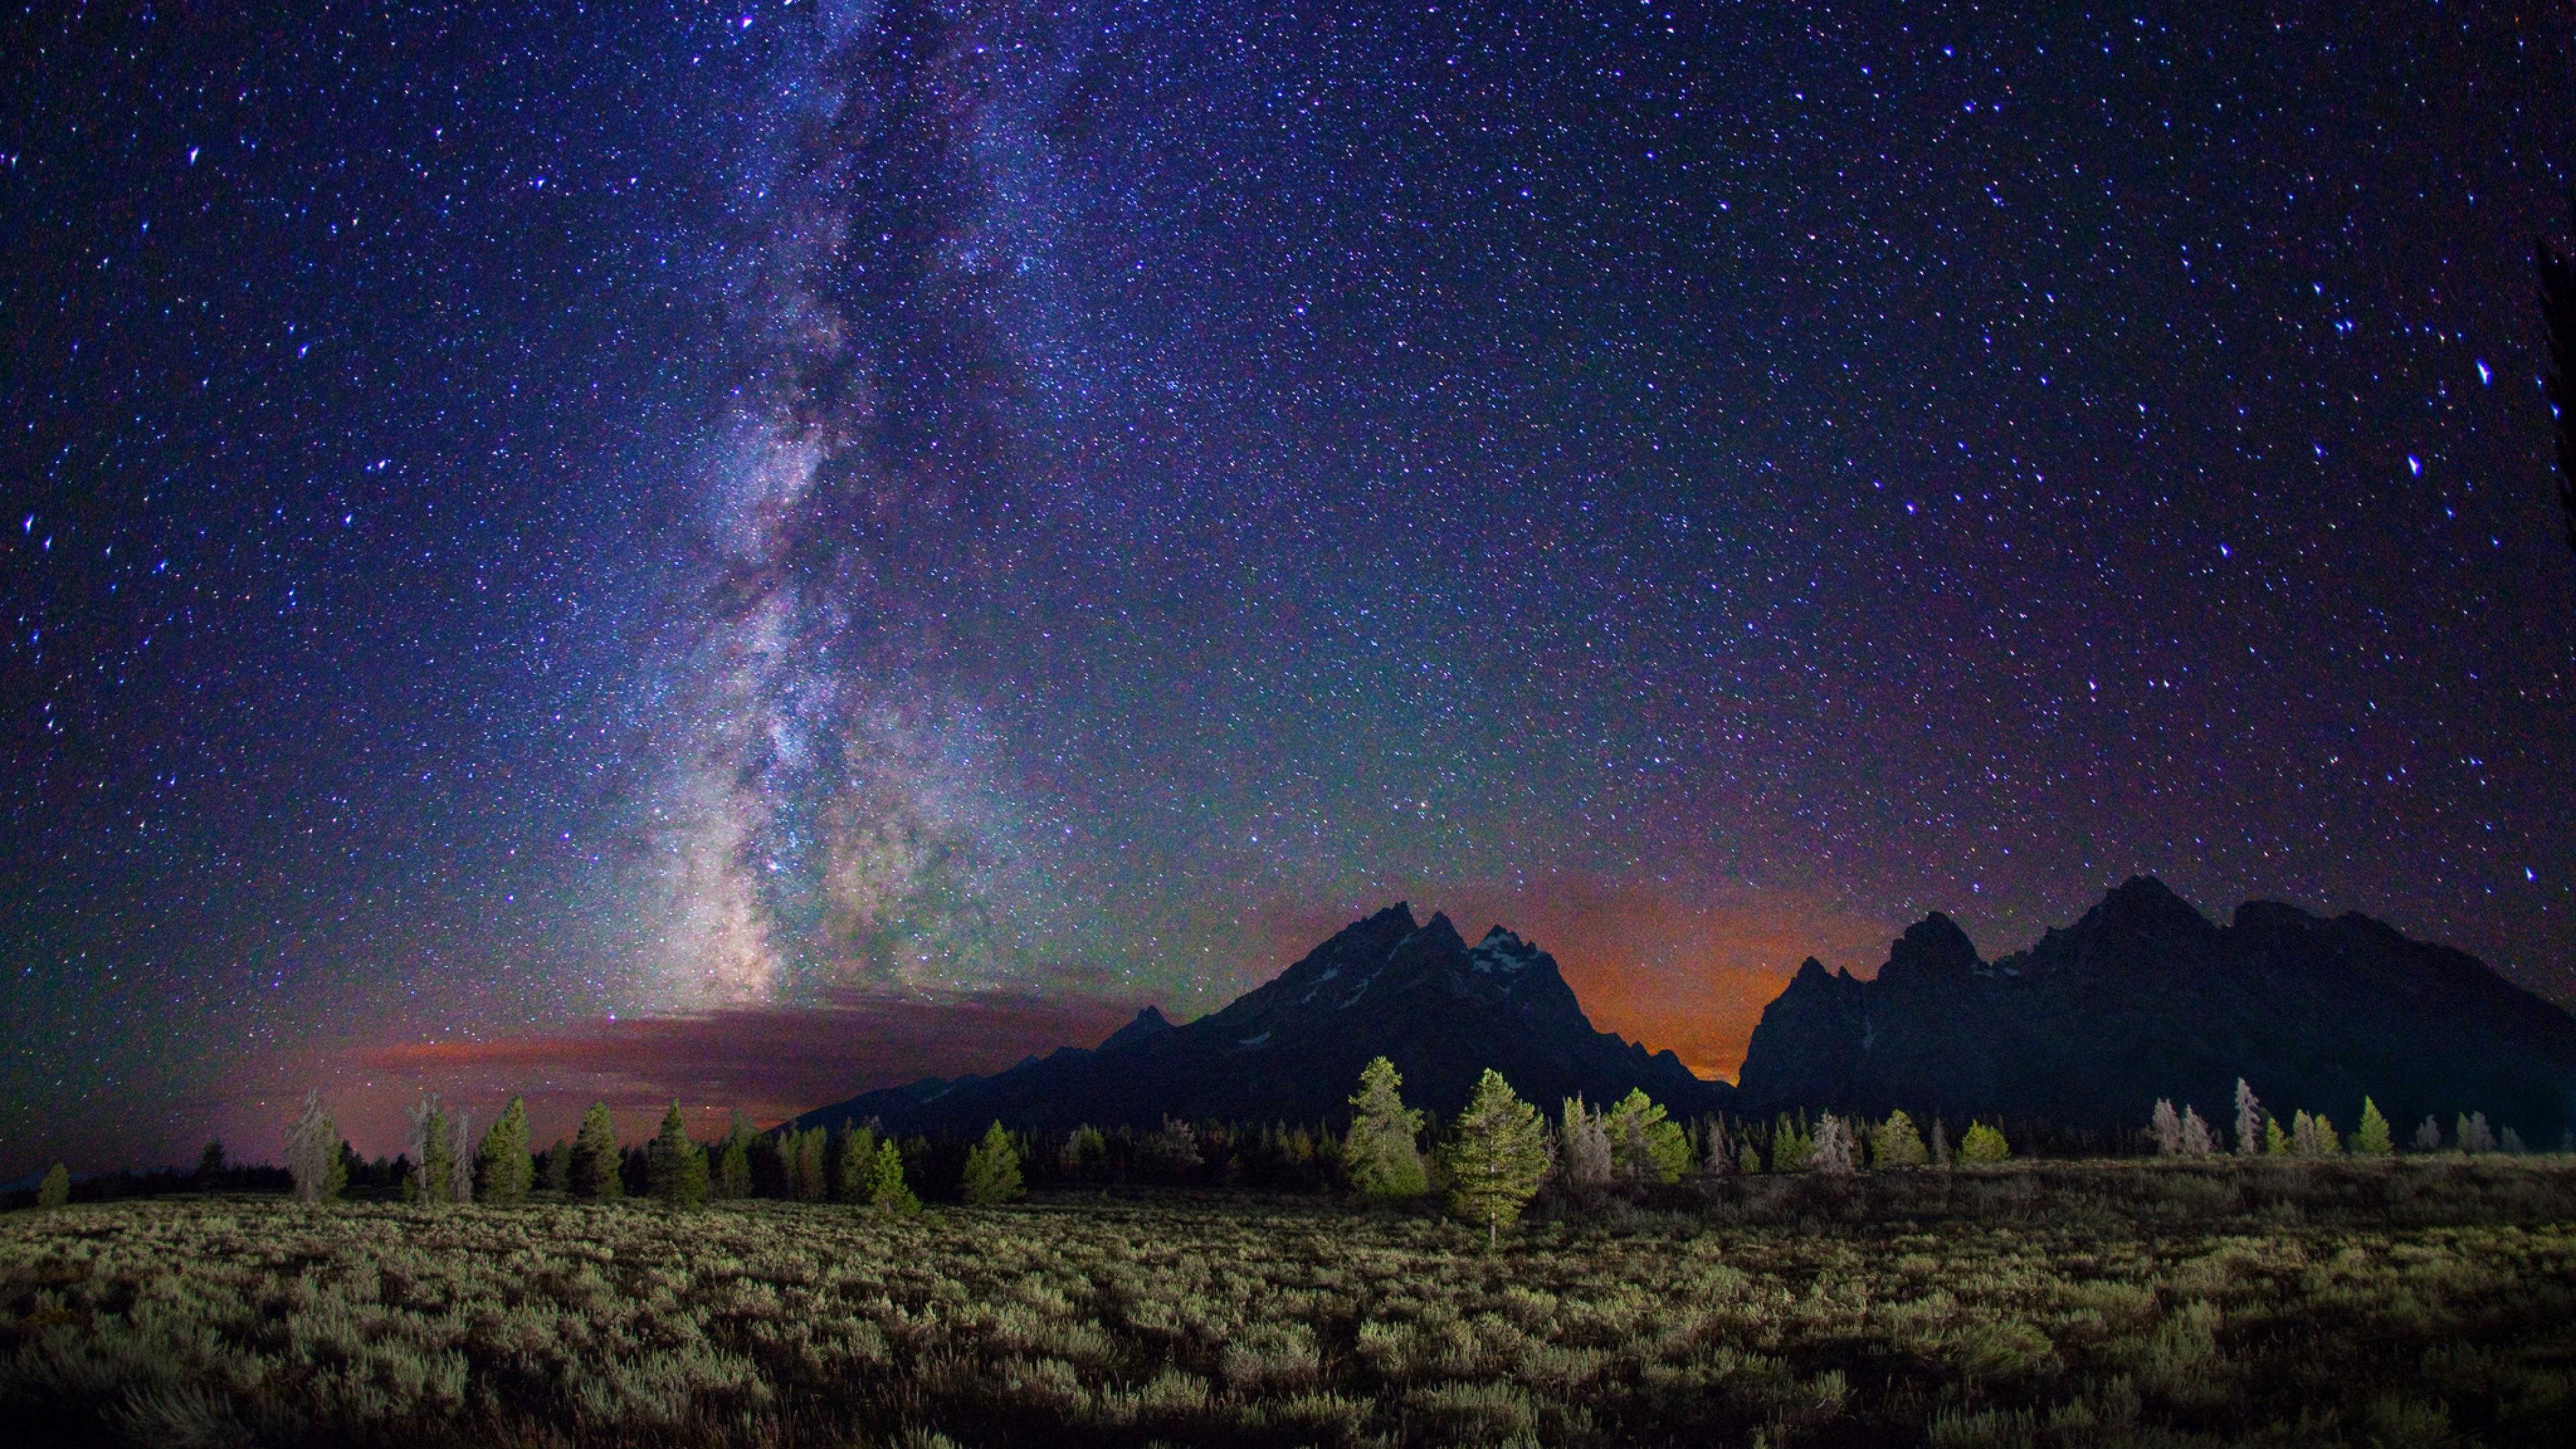 Wallpaper 3840x2160 milky way stars mountains field night 4K 3840x2160